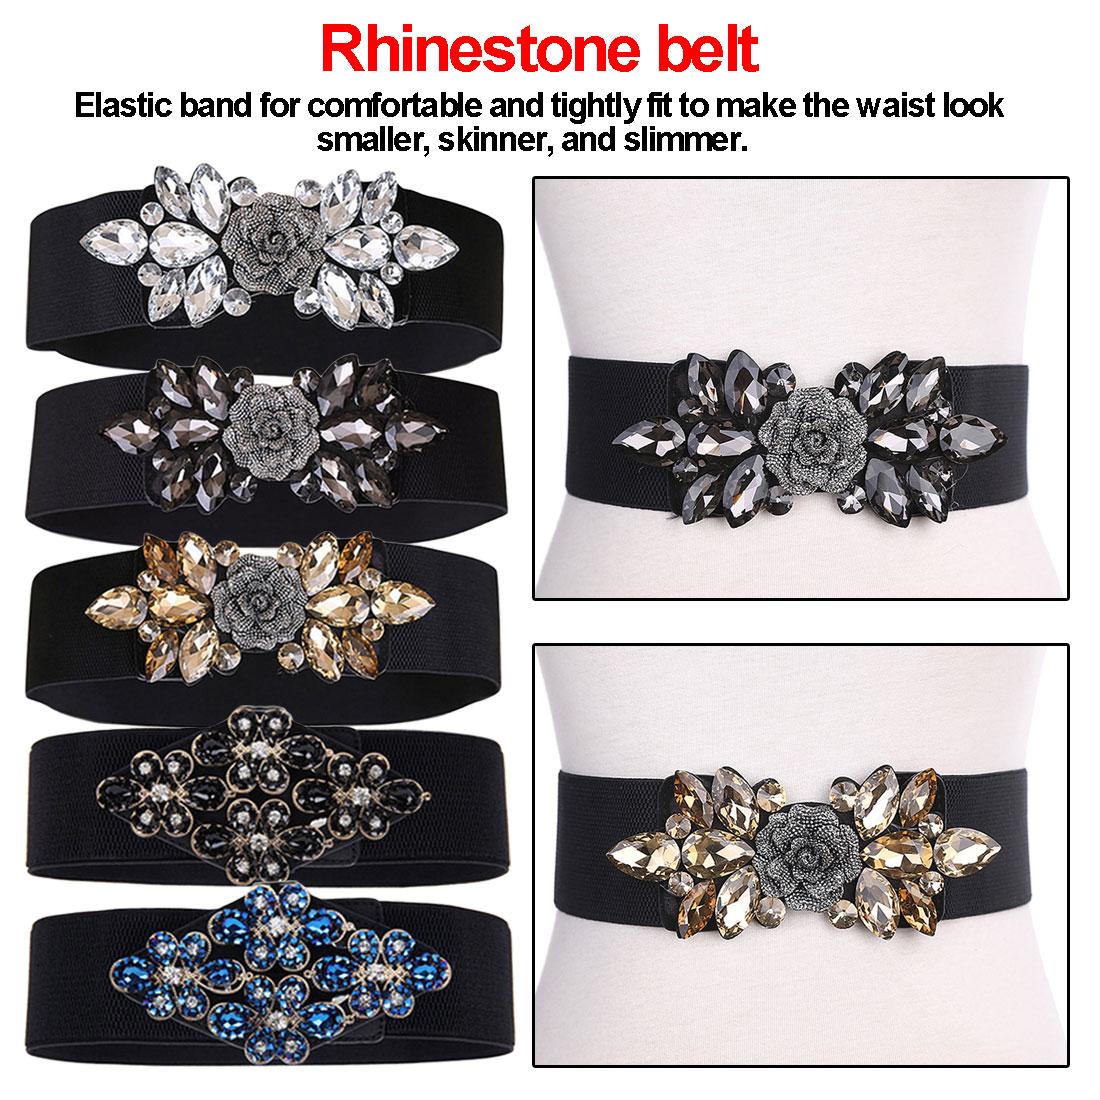 Luxury Brand Wide Floral Rhinestone Belt Buckles Stretchy Elastic Waist Belt Fashion Design Waistband For Ladies Women Belts